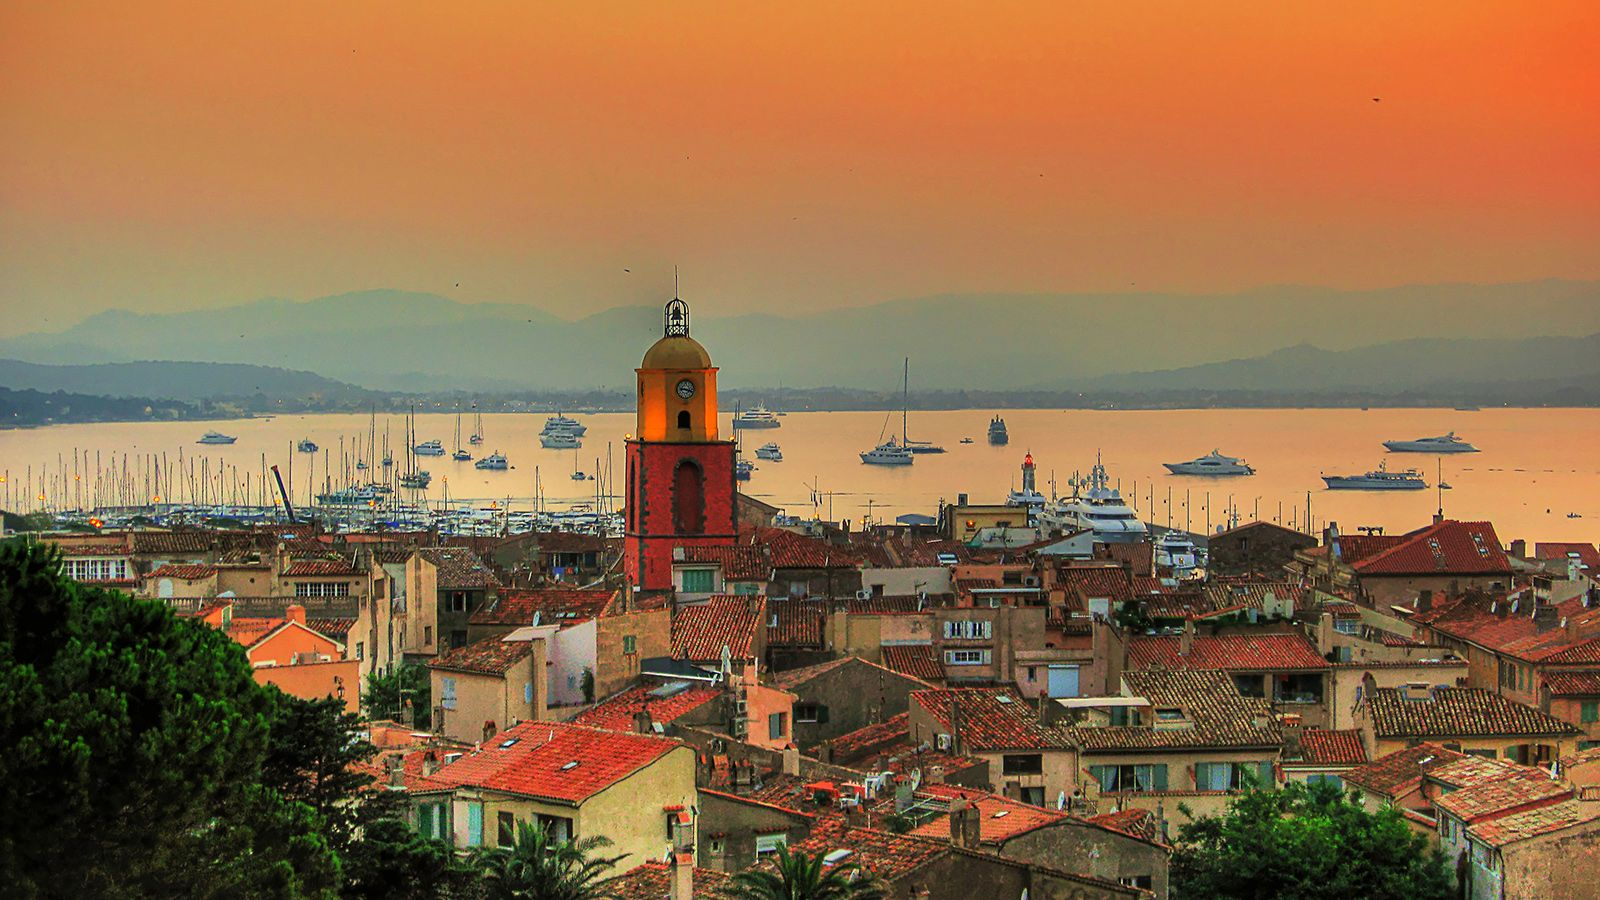 St Tropez France Wallpapers   Top St Tropez France 1600x900